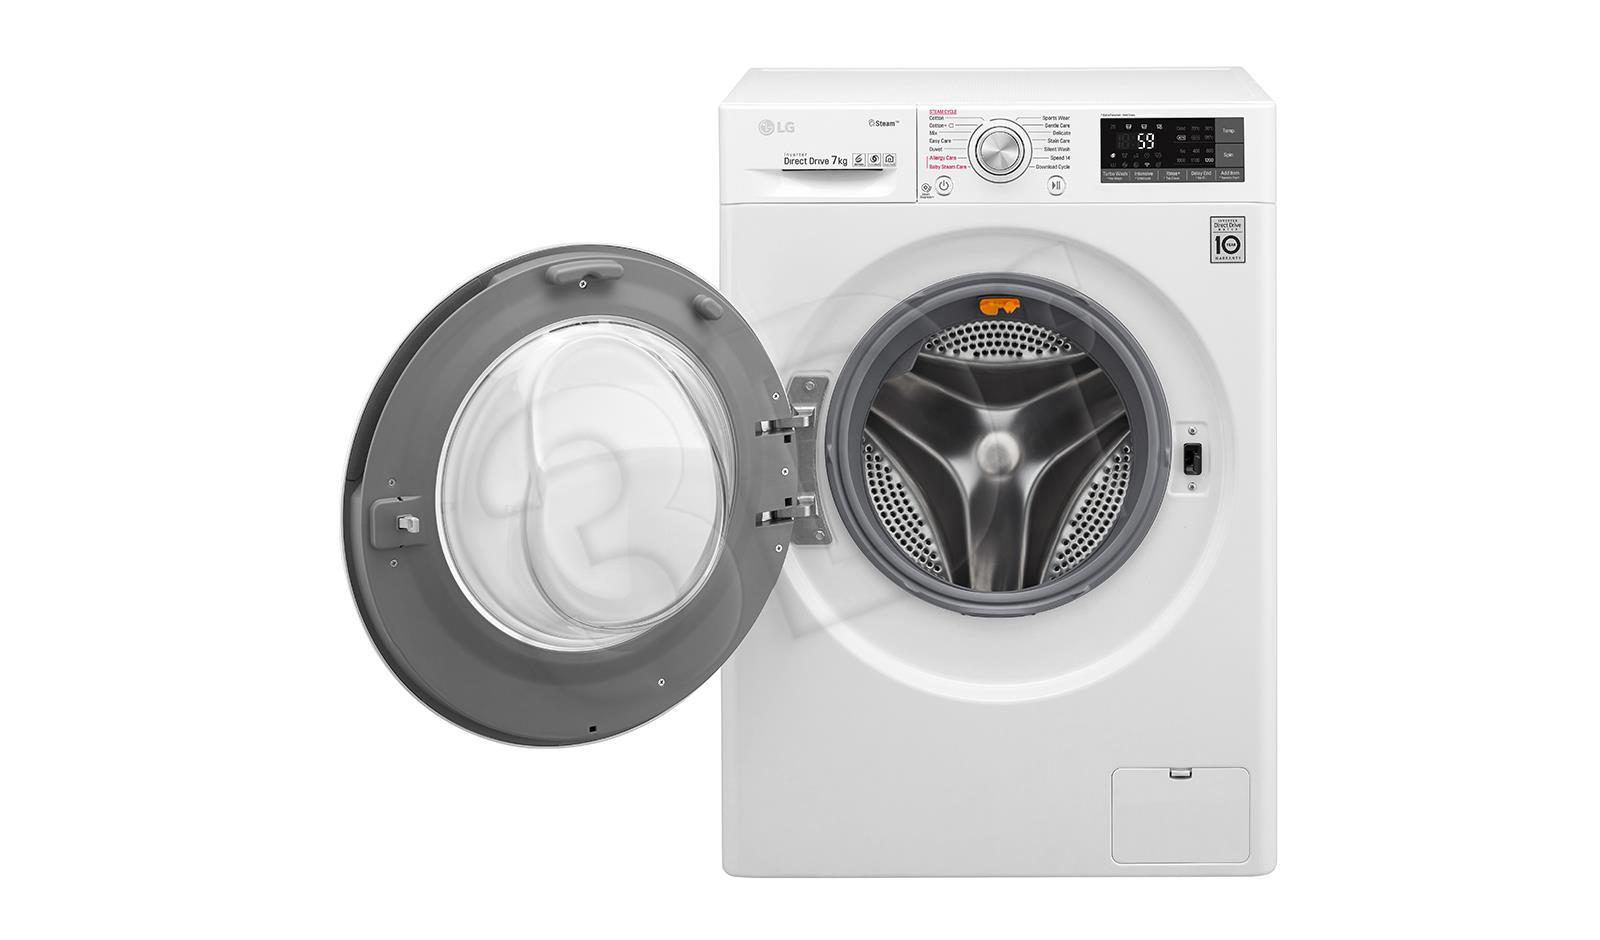 Washing machine   LG  F2J7HY2W (1200 rpm; 7 kg; 450 mm; Class A+++; white color) F2J7HY2W Veļas mašīna